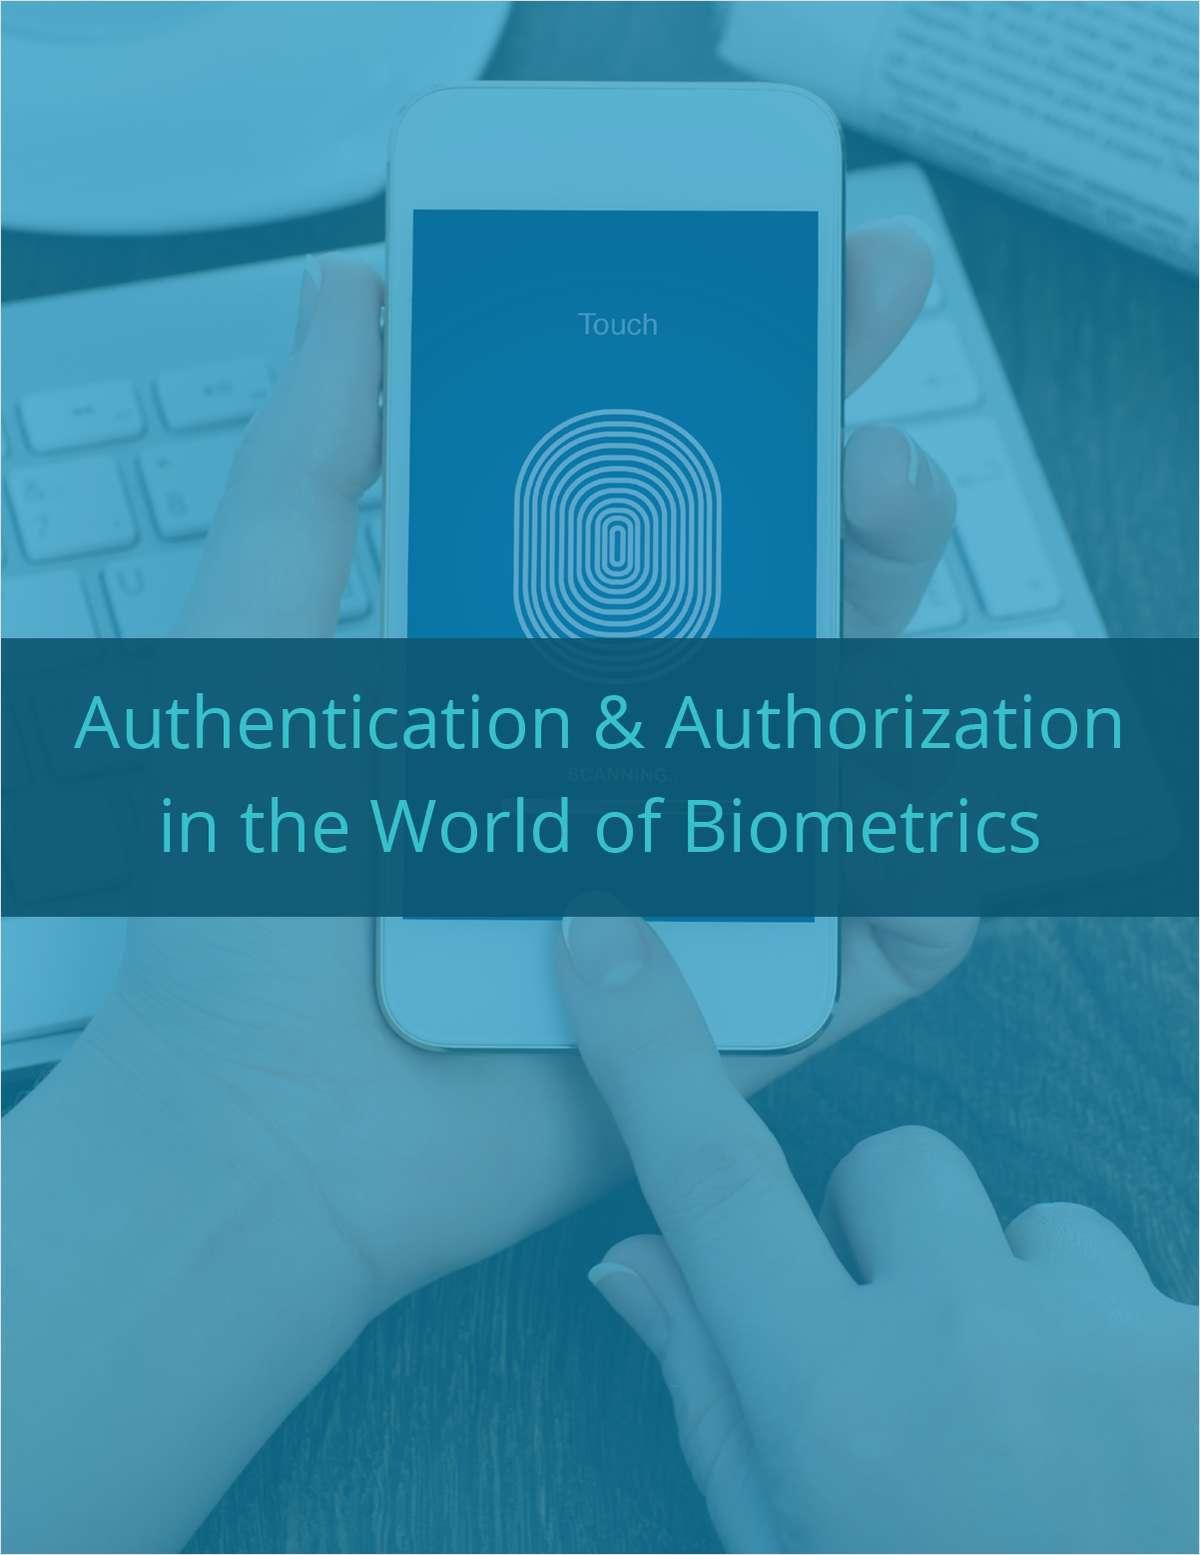 Authentication & Authorization in the World of Biometrics